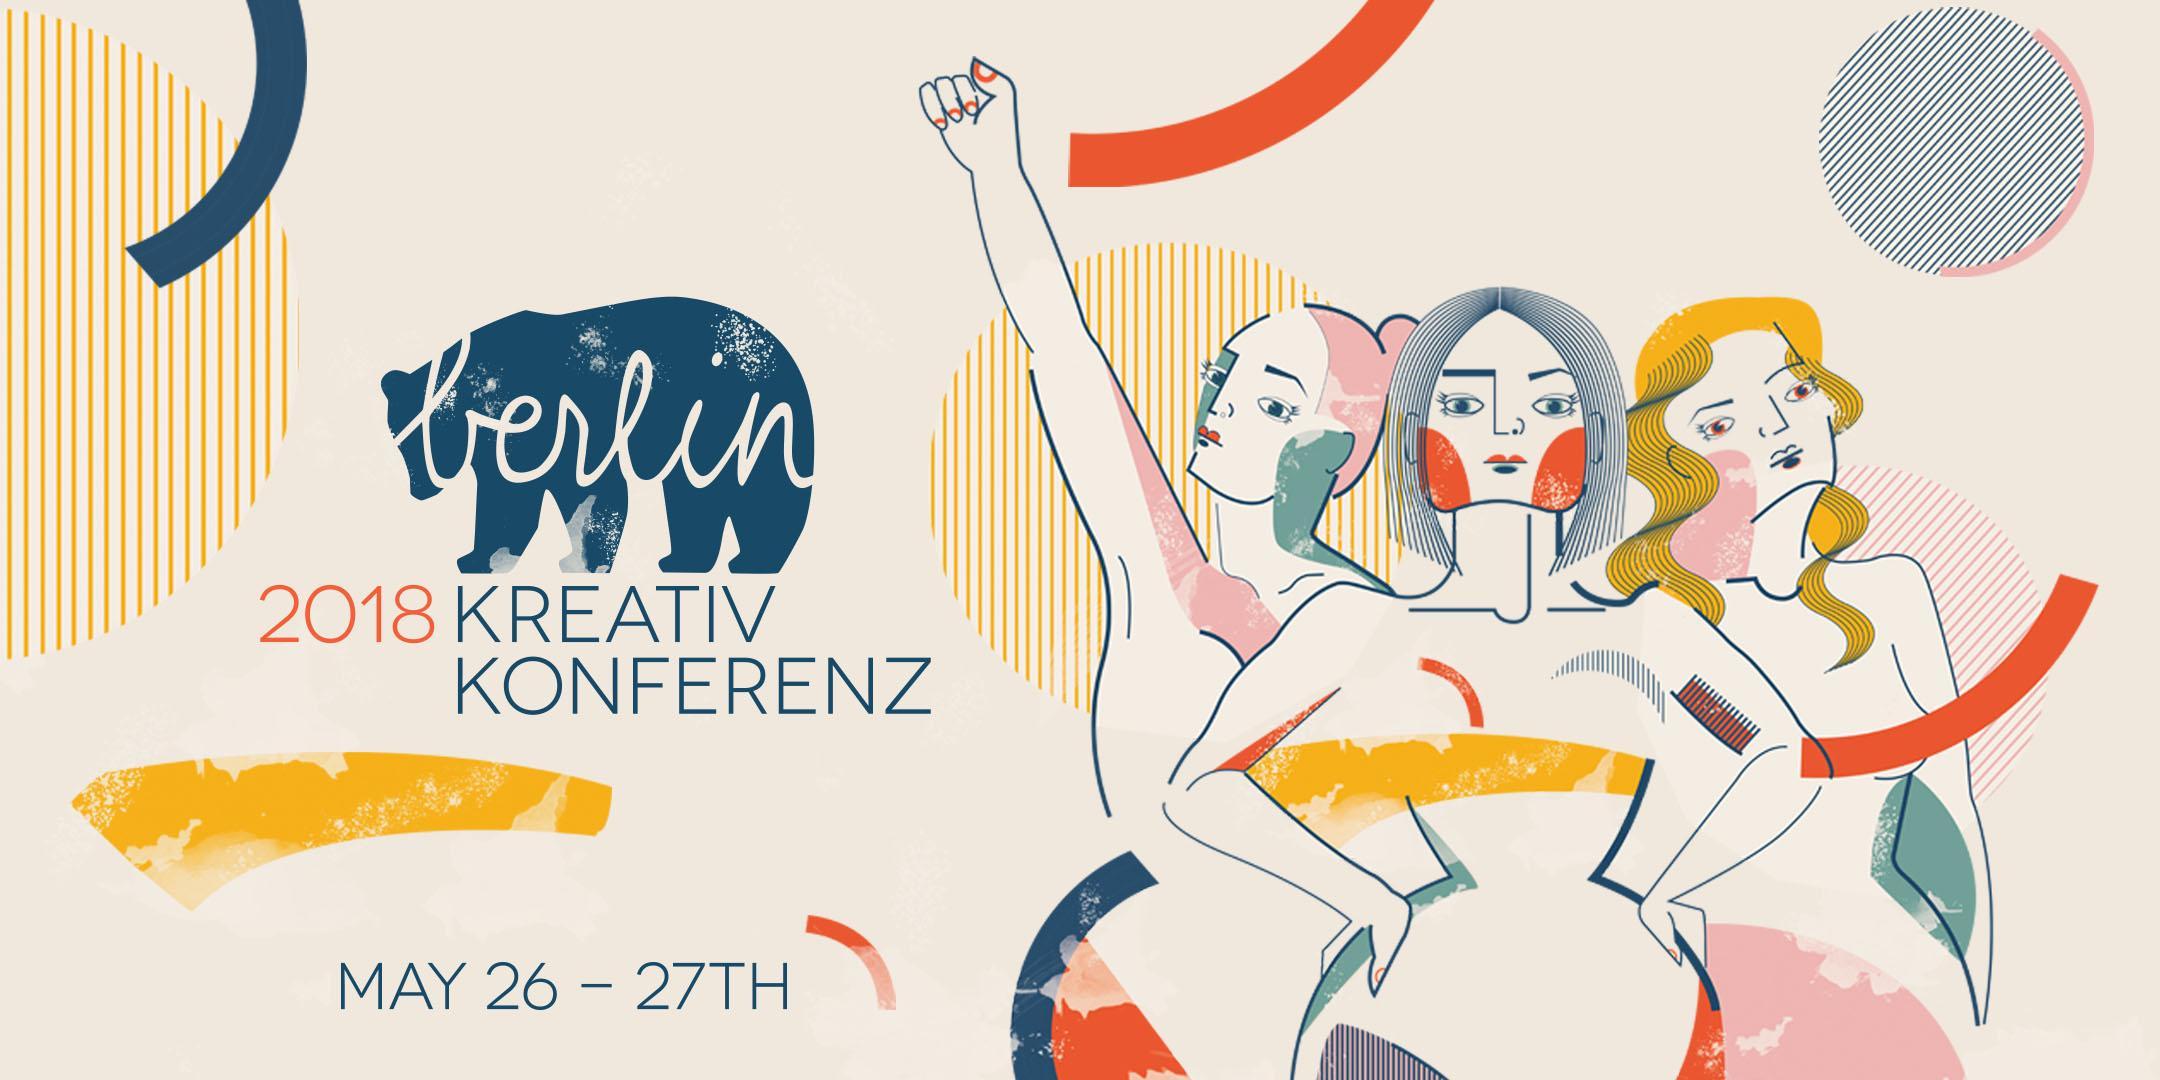 Berlin Kreativ Konferenz - Saturday Ticket